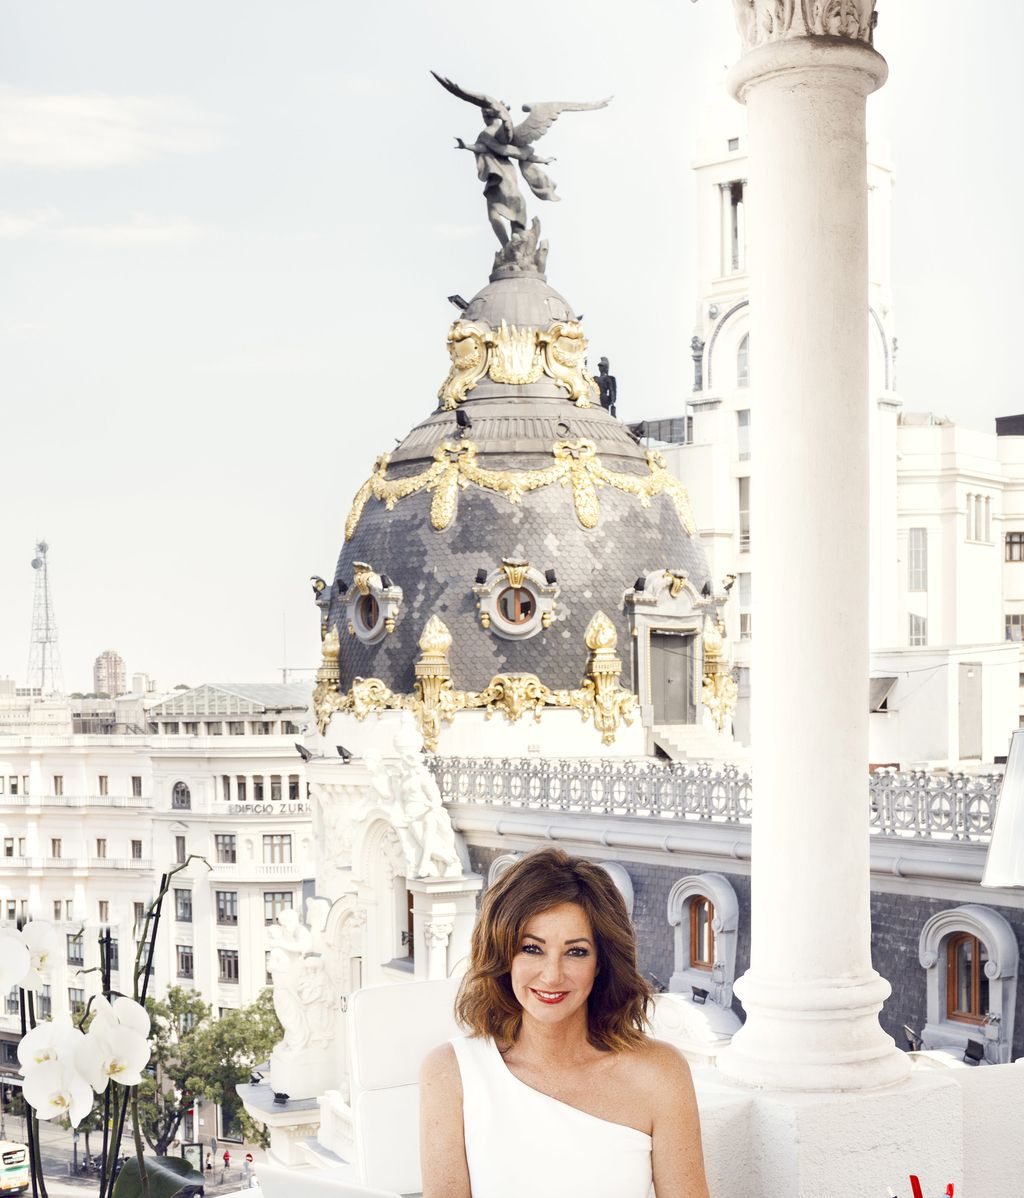 'El programa de Ana Rosa' estrena temporada 2017/2018